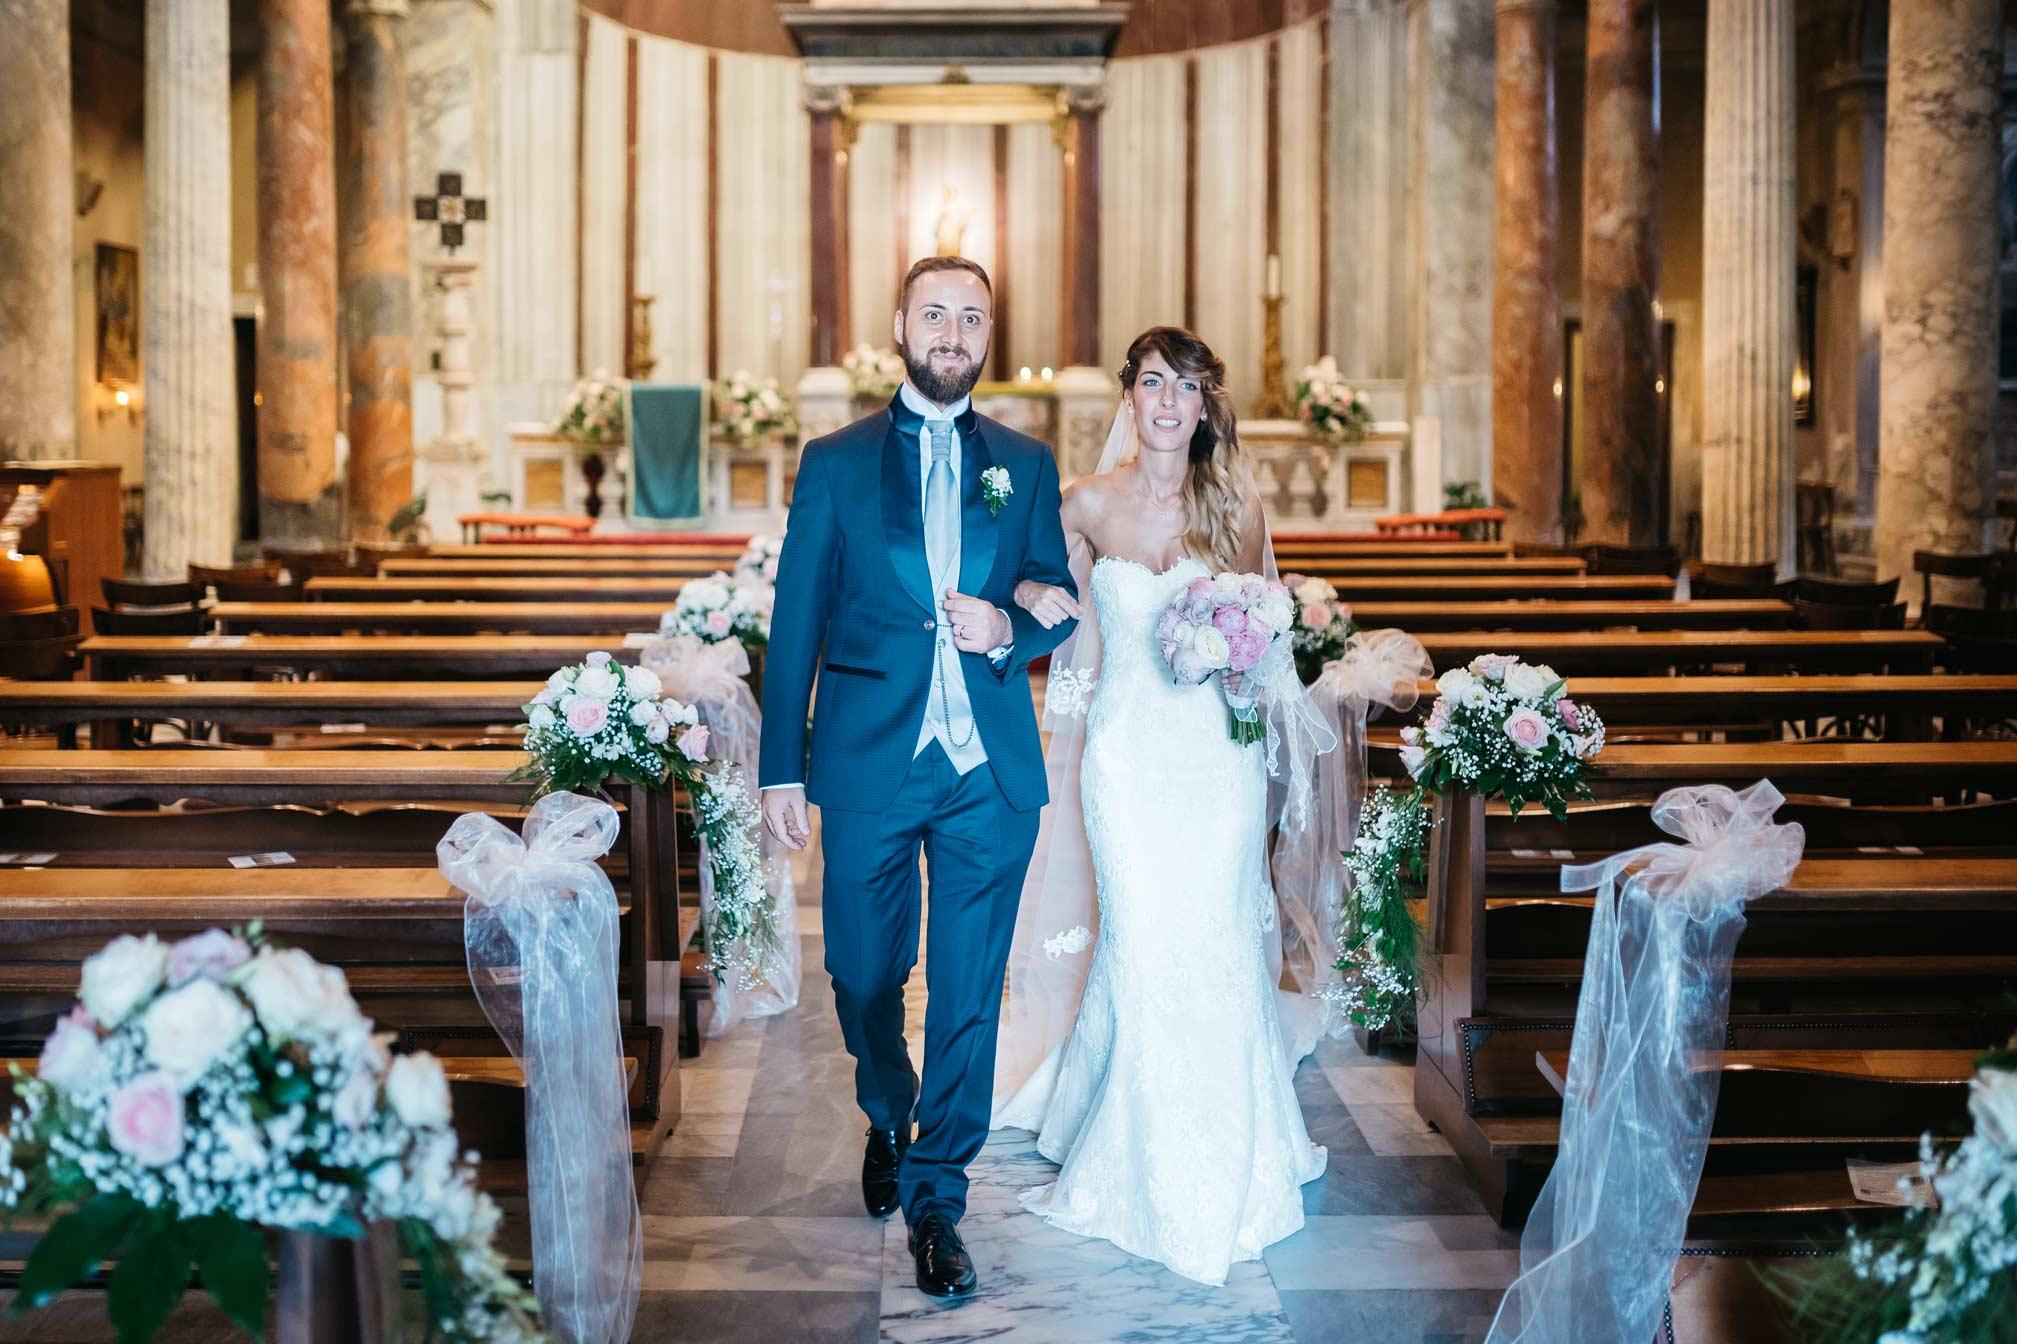 Fotografo-Matrimoni-Roma-Reportage-Cerimonia